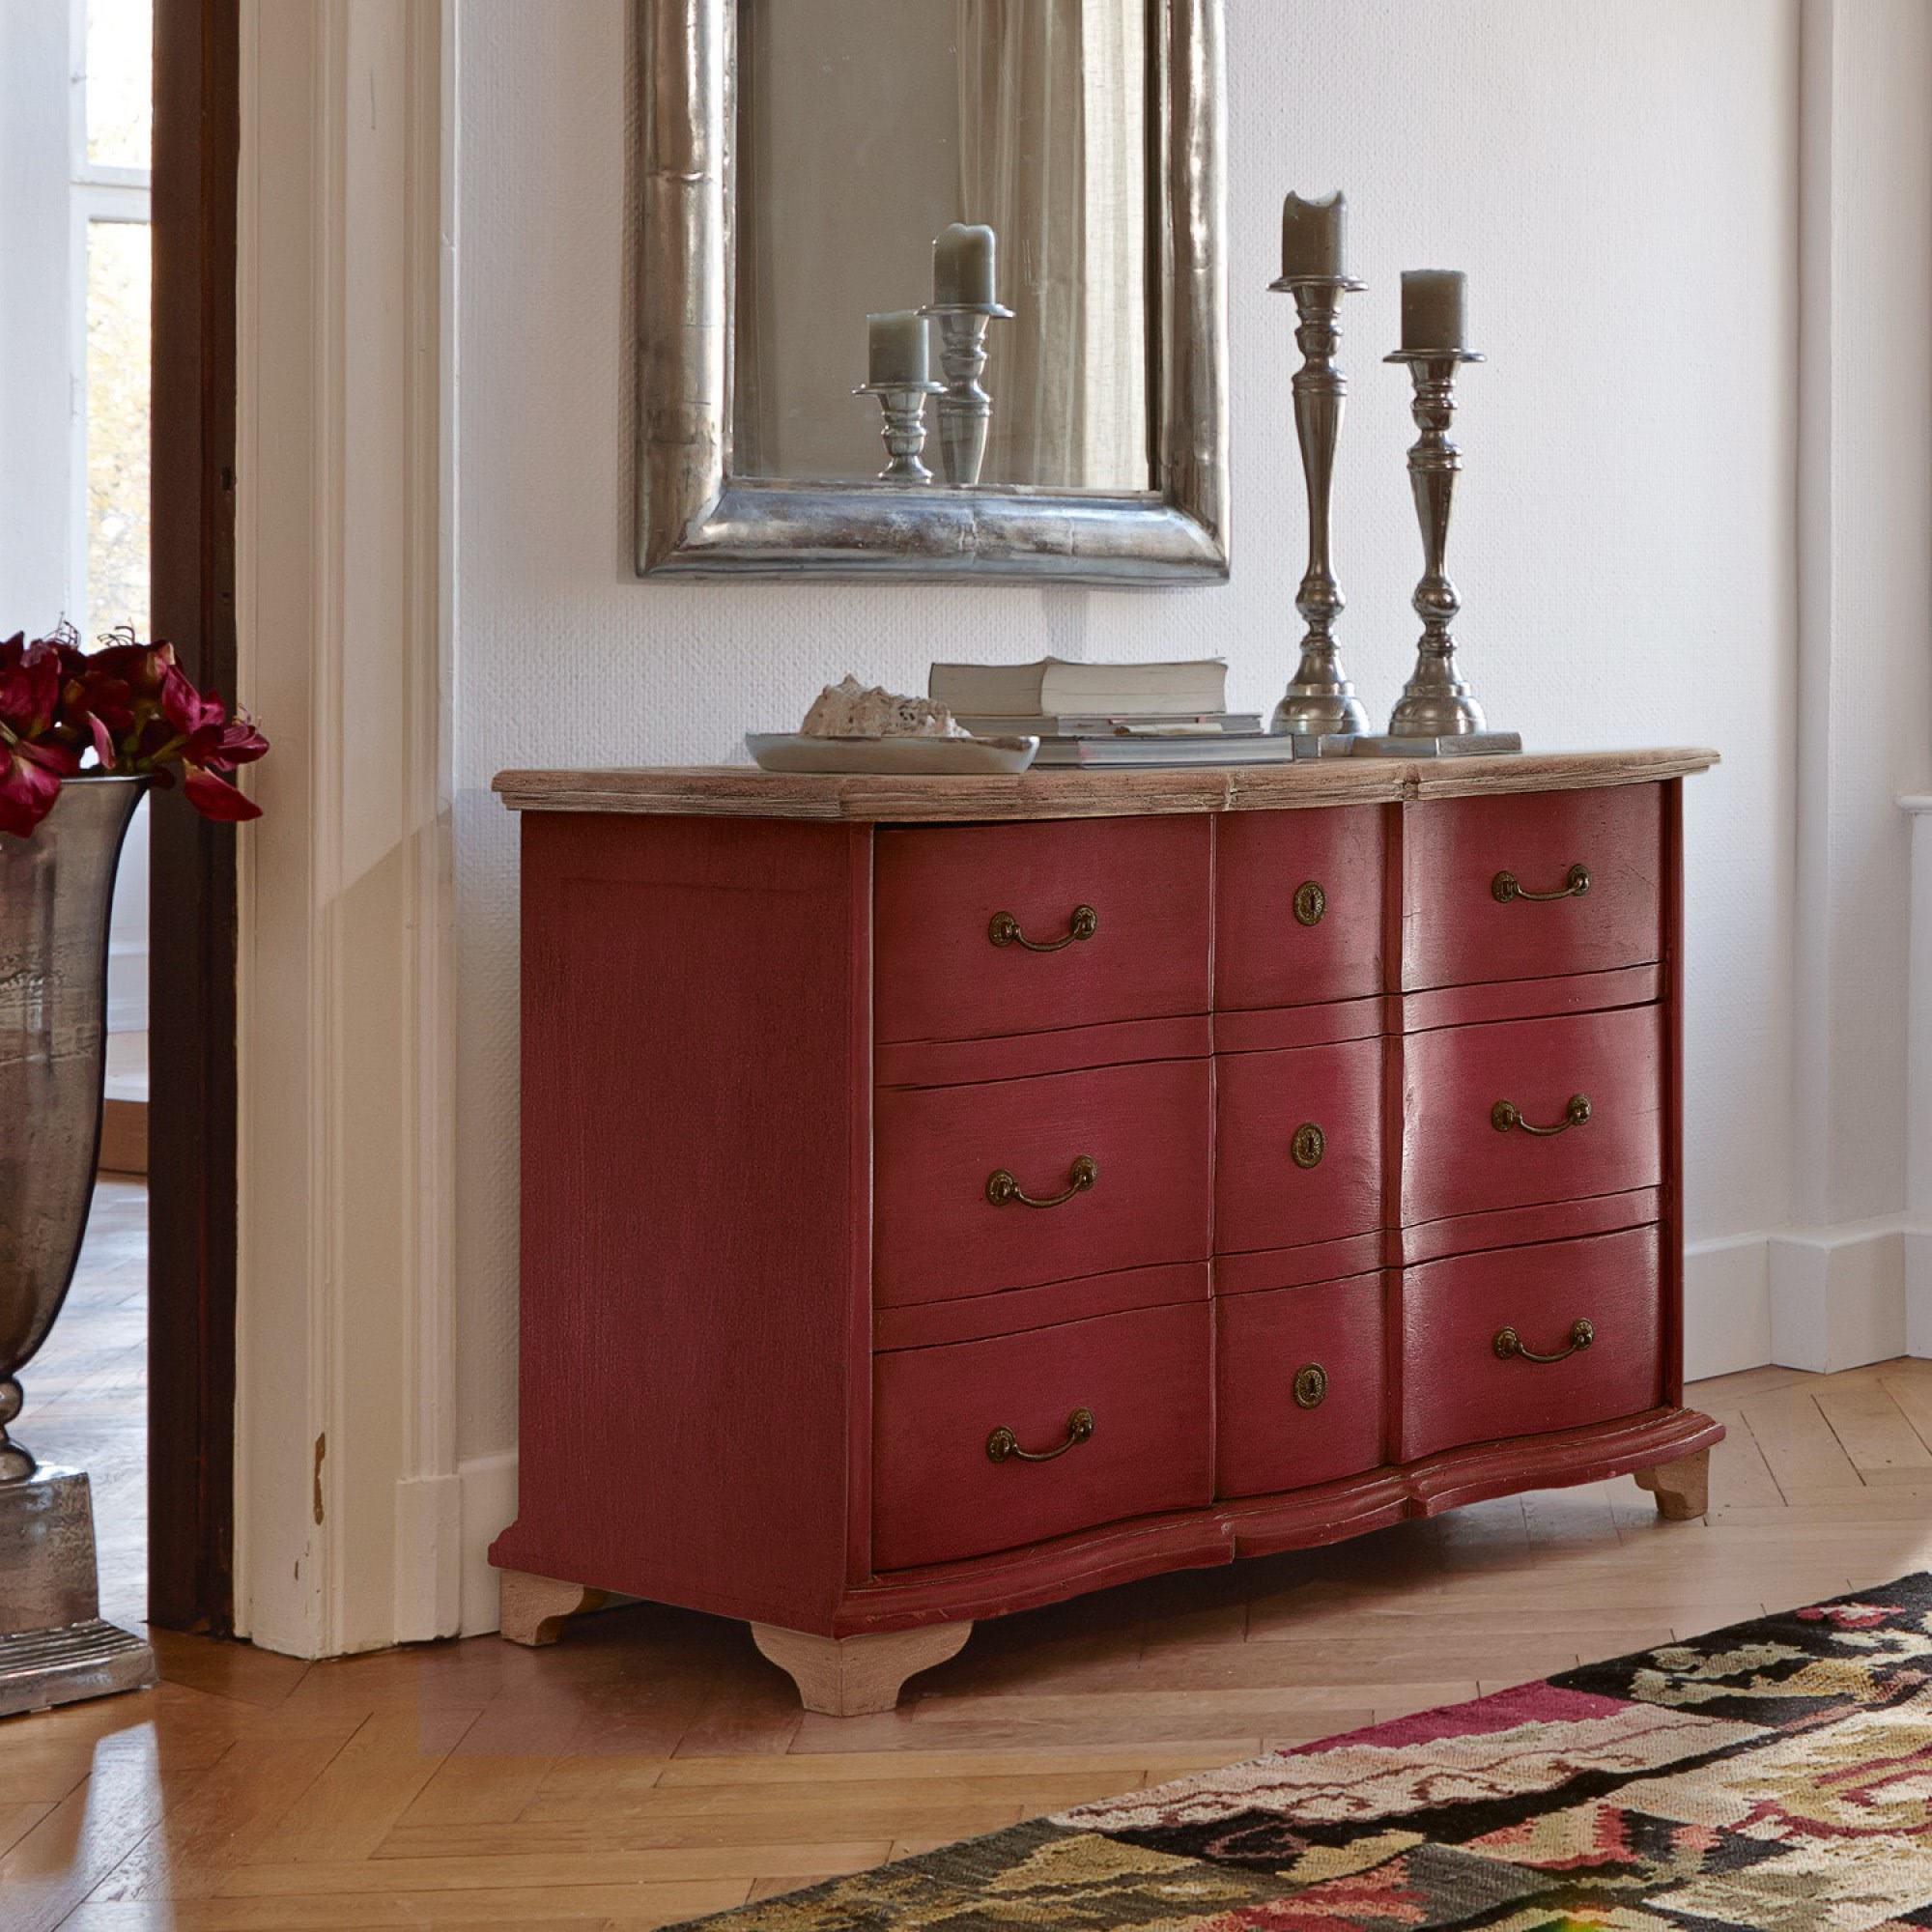 Ledergriffe Mbel Badezimmer Schlafzimmer Sessel